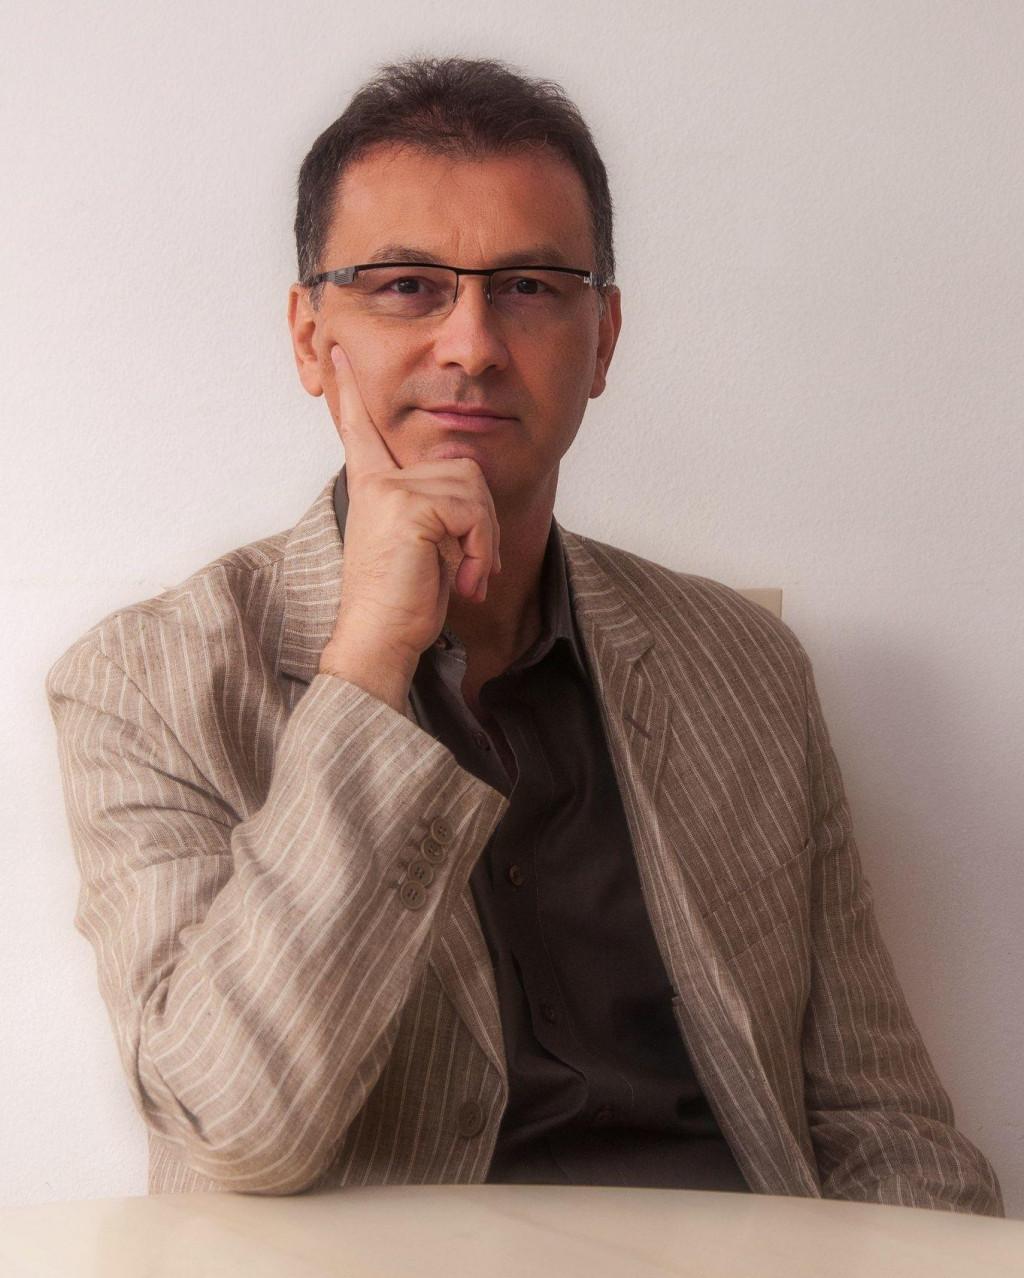 <br /> Prof. dr. sc. Pero Maldini, politolog i sveučilišni profesor